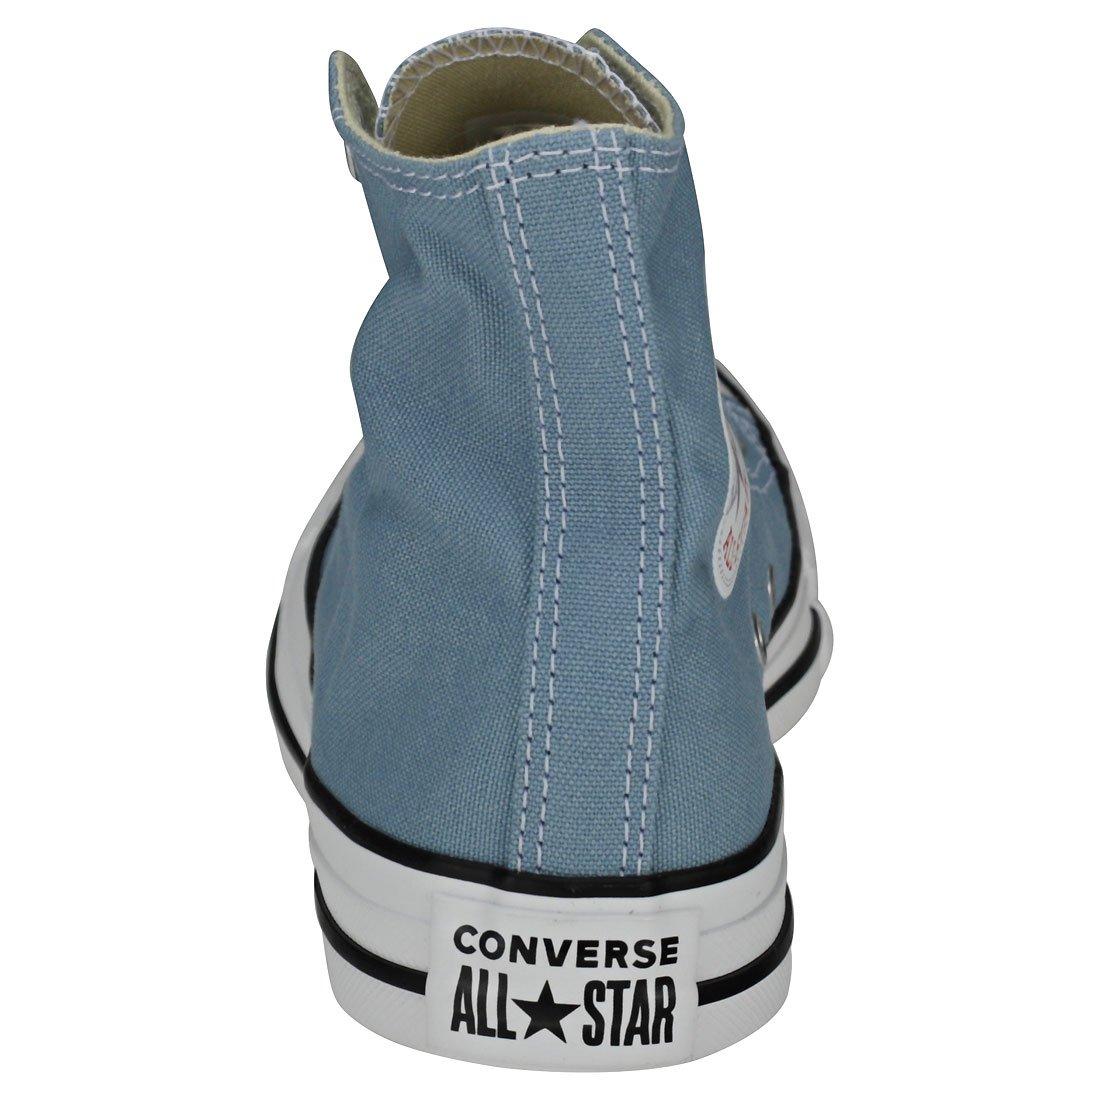 Converse Unisex-Erwachsene Chuck Taylor CTAS Hi Sneakers Blau Denim (Washed Denim Blau 444) 439300